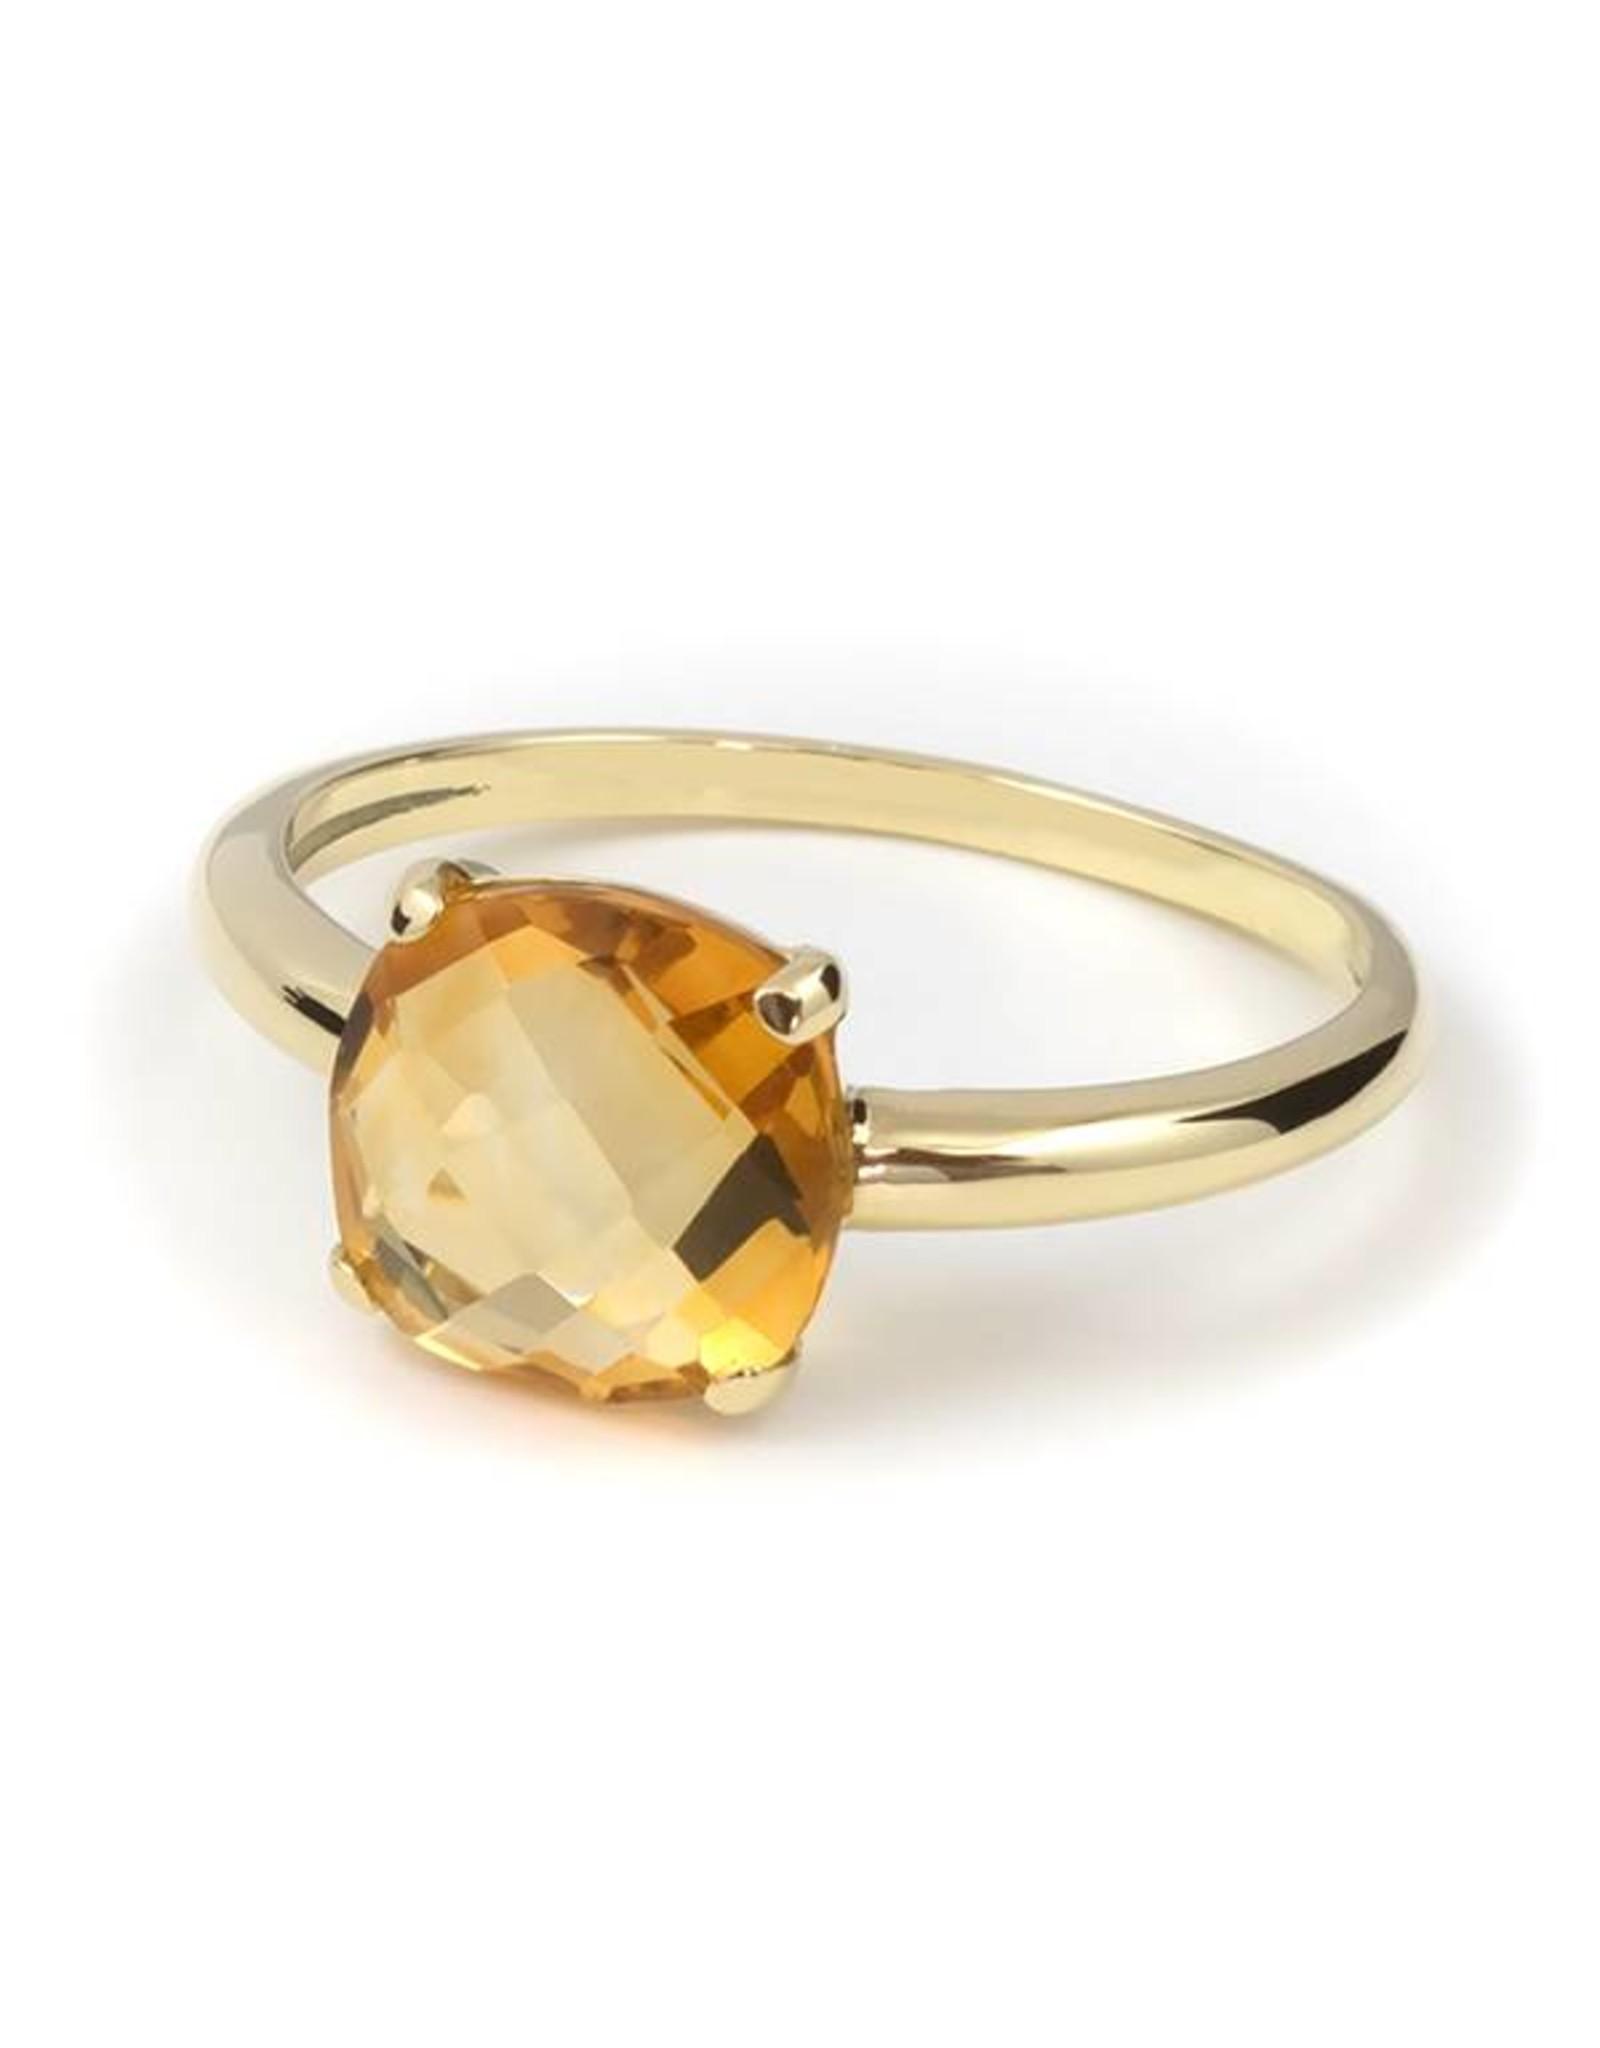 Navarro Ring - Gold + Citrine